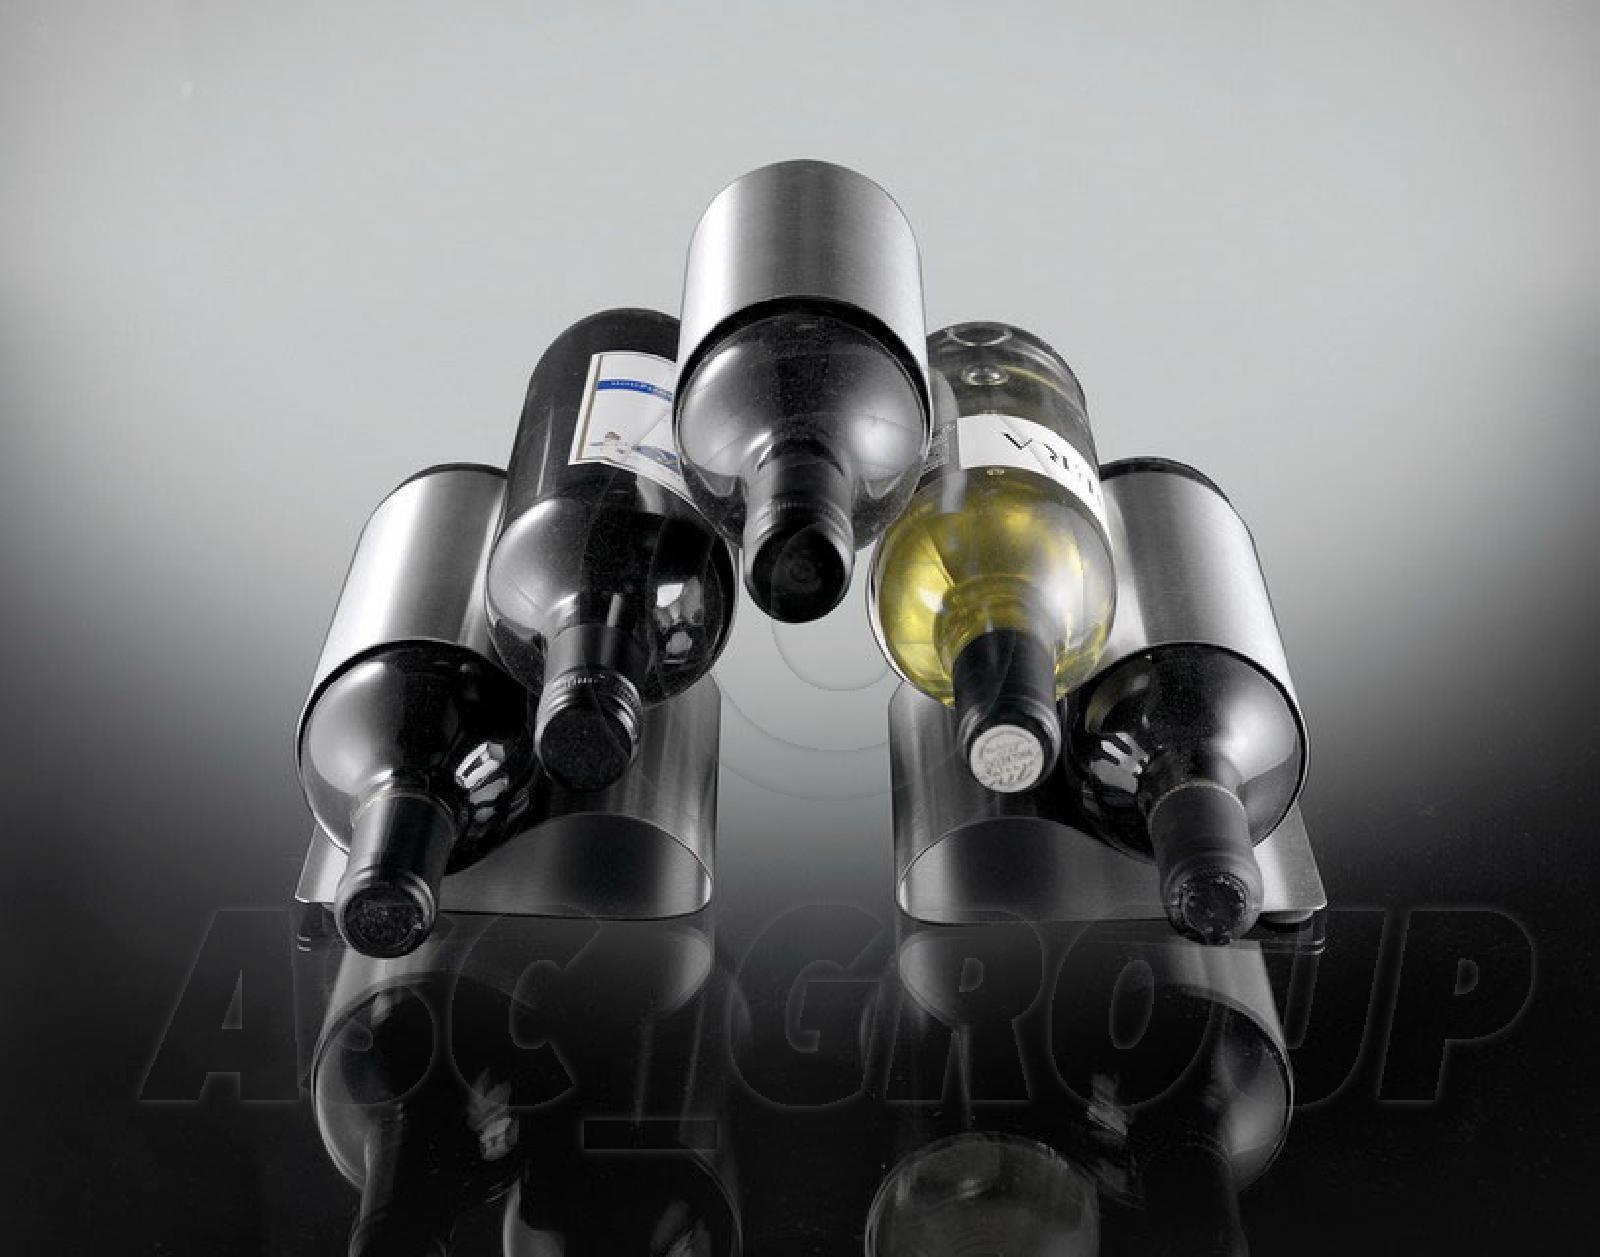 Curled Metal 5 Bottle Wine Bottle Holder Rack Modern